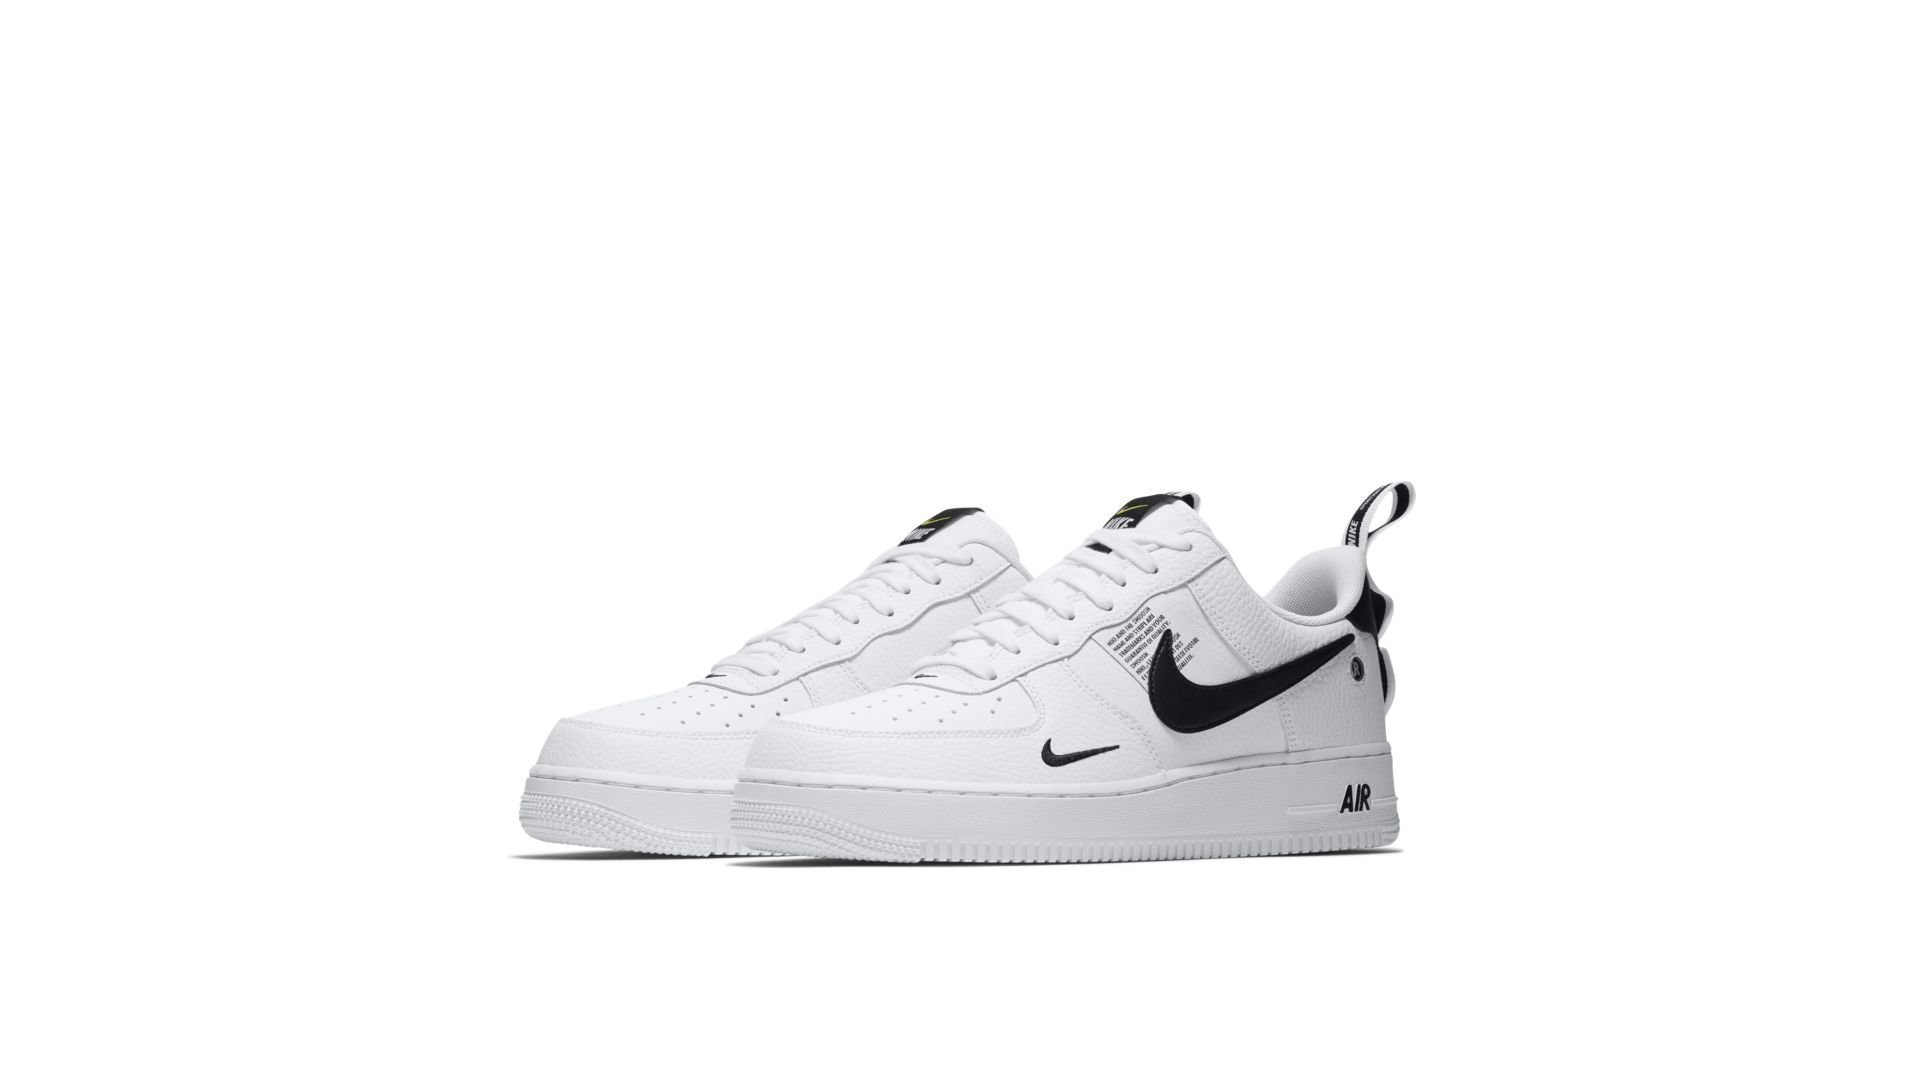 Nike Air Force 1 Low Utility White Black (AJ7747 100)